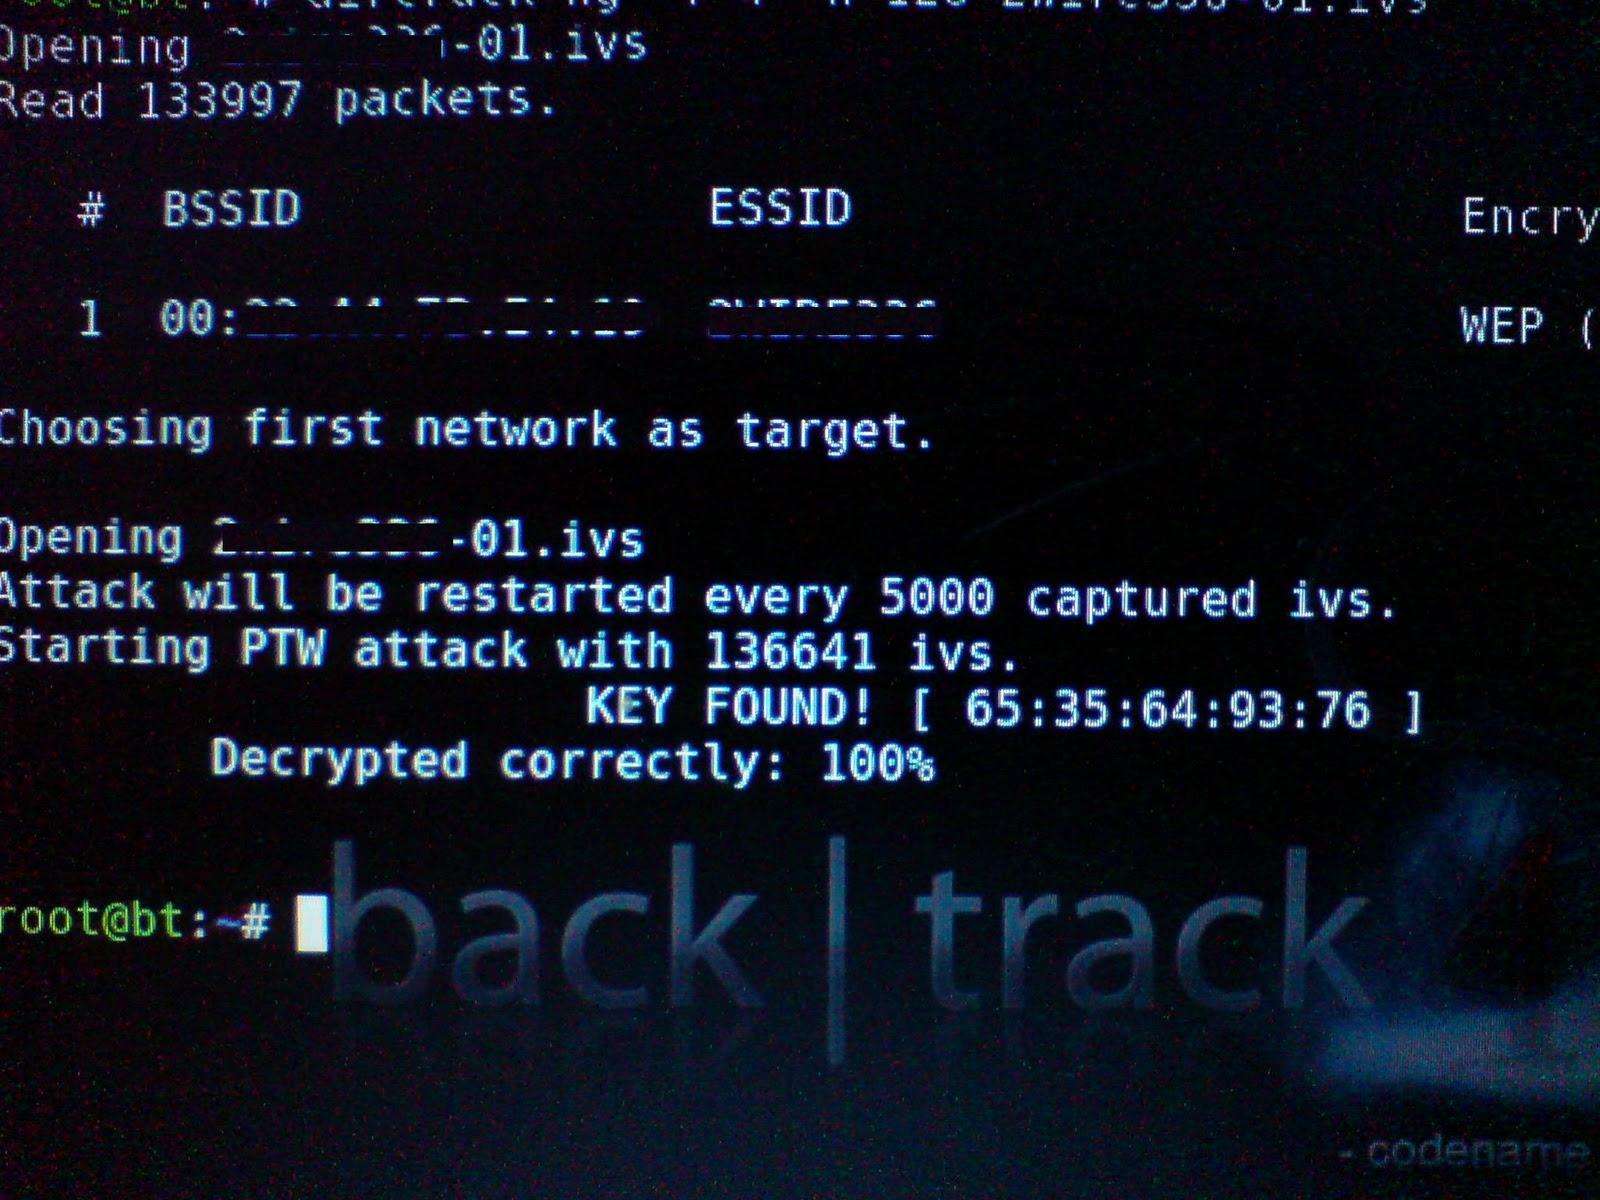 cracking 12 character password